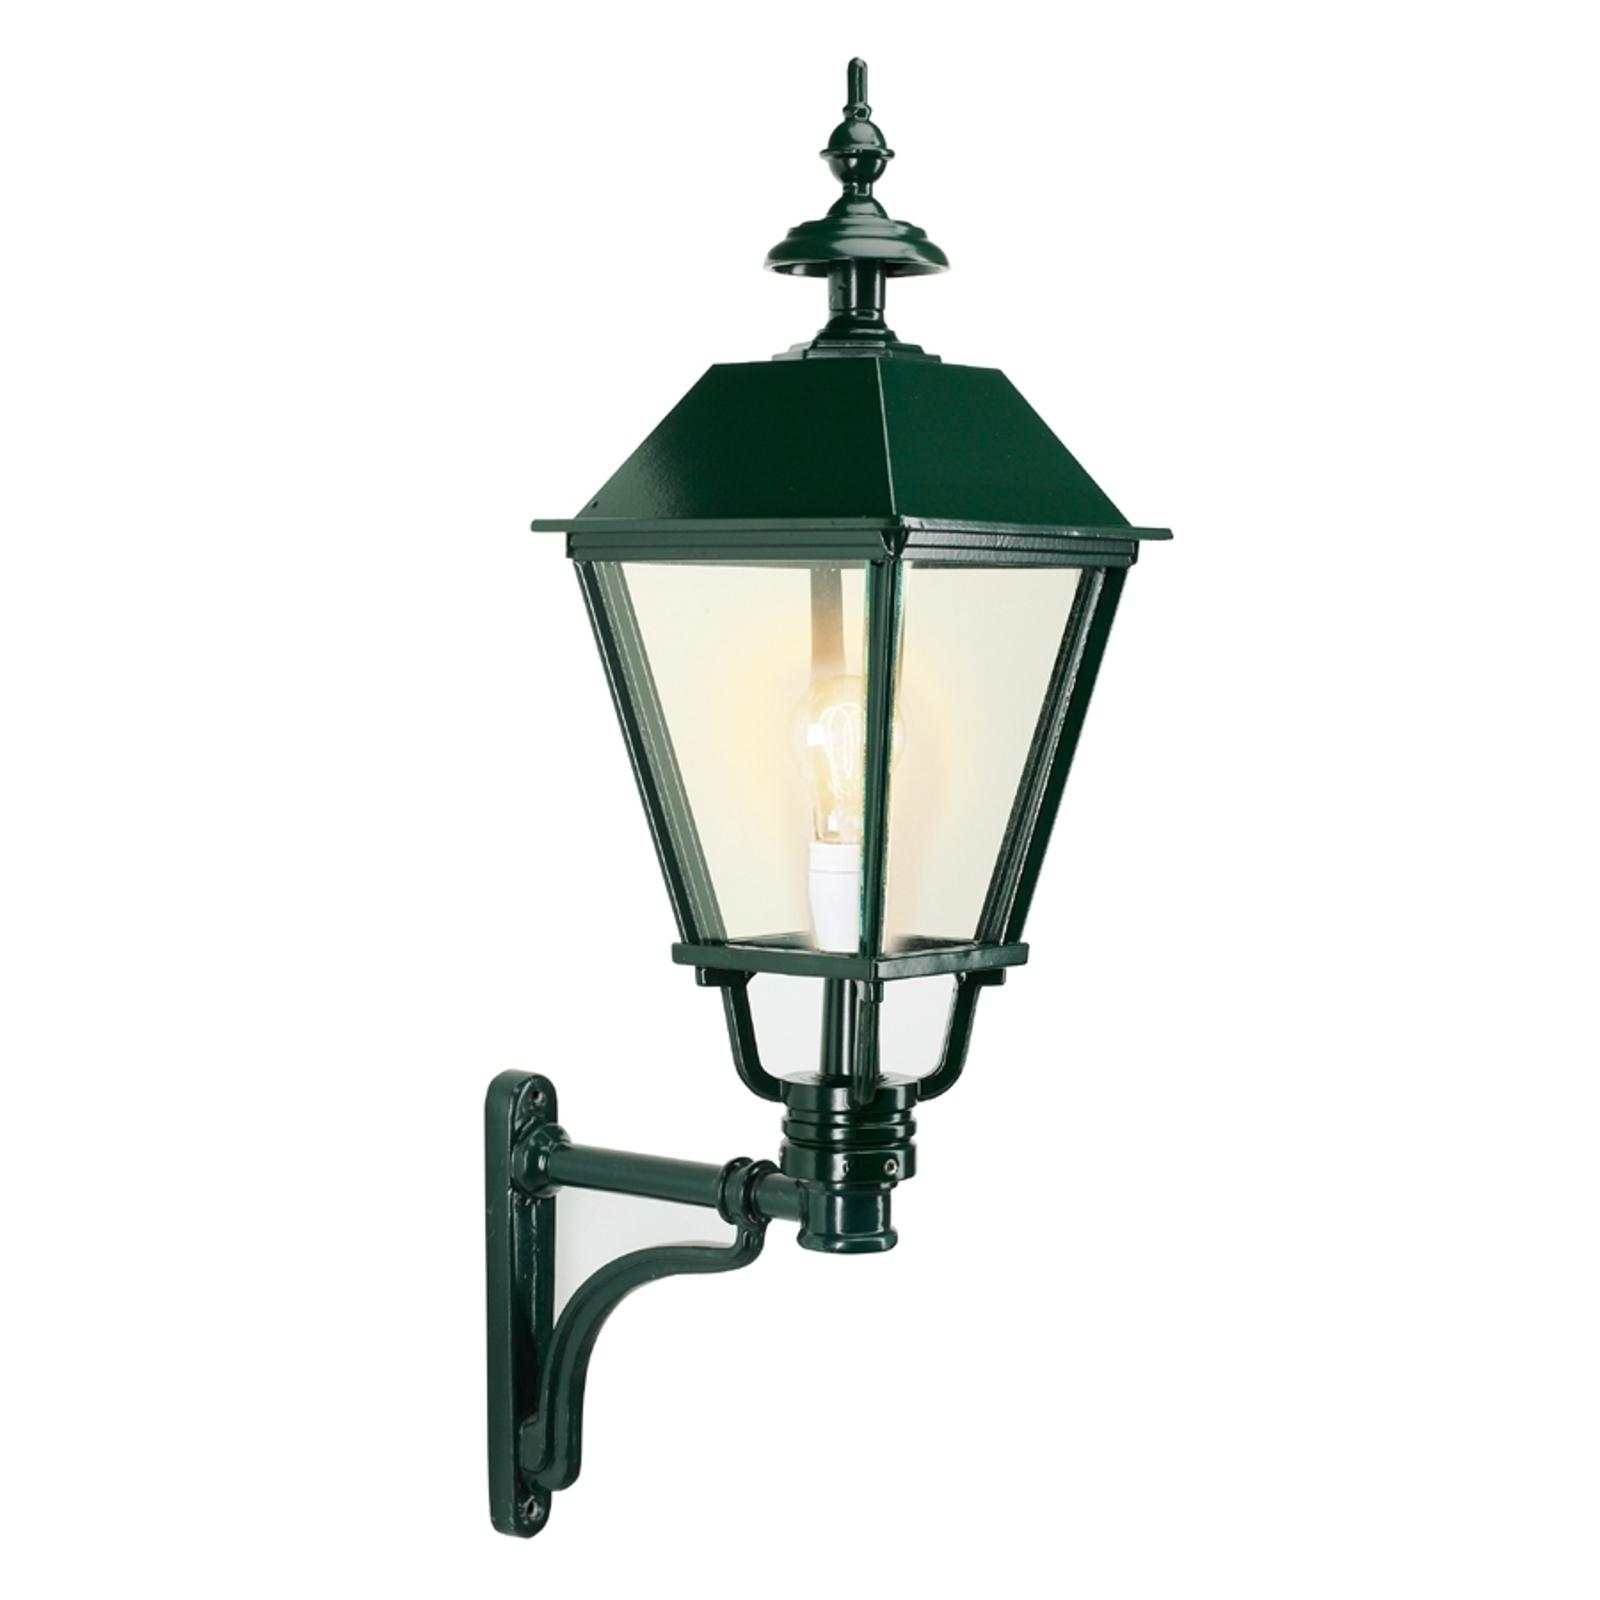 Klassieke buitenwandlamp Eemnes, groen